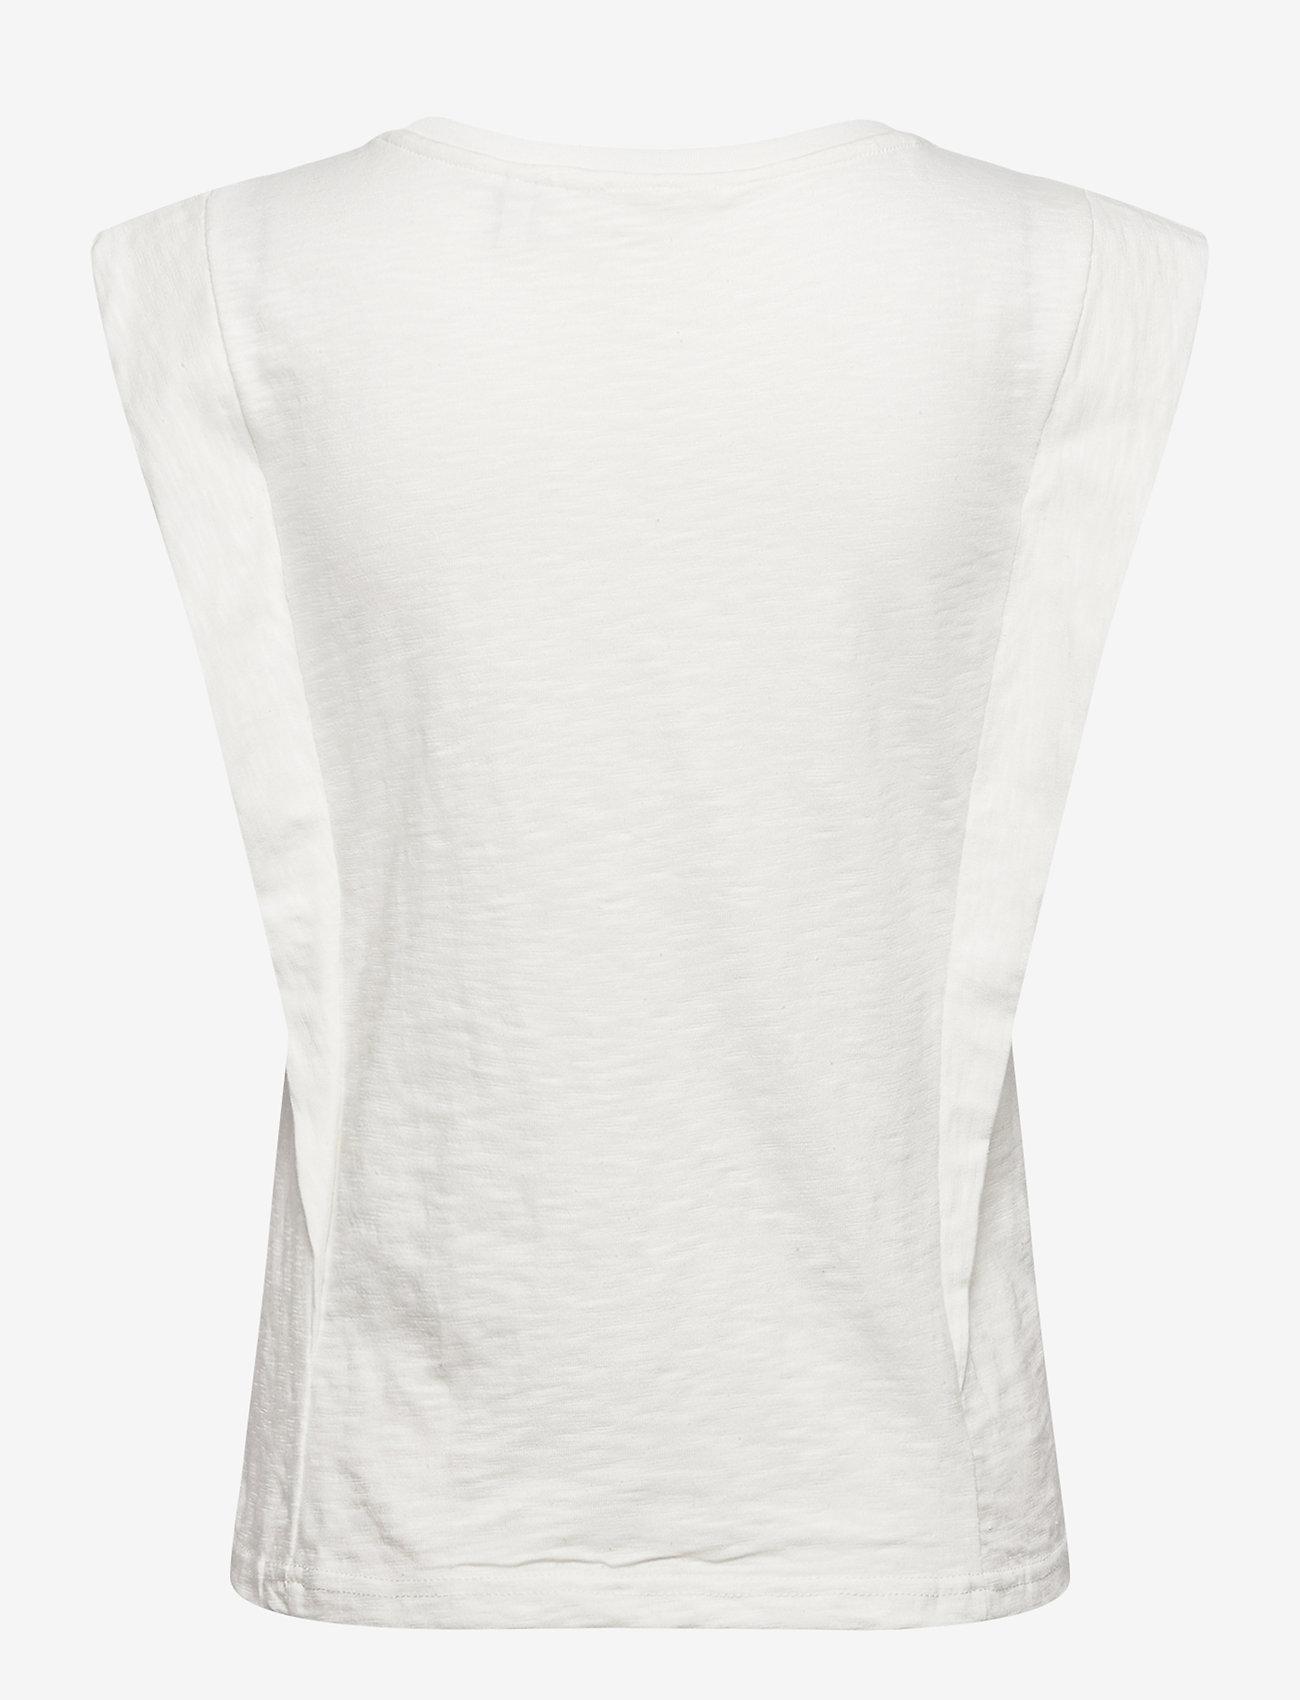 b.young - BYTELLA SLEEVELESS - - sleeveless tops - off white - 1